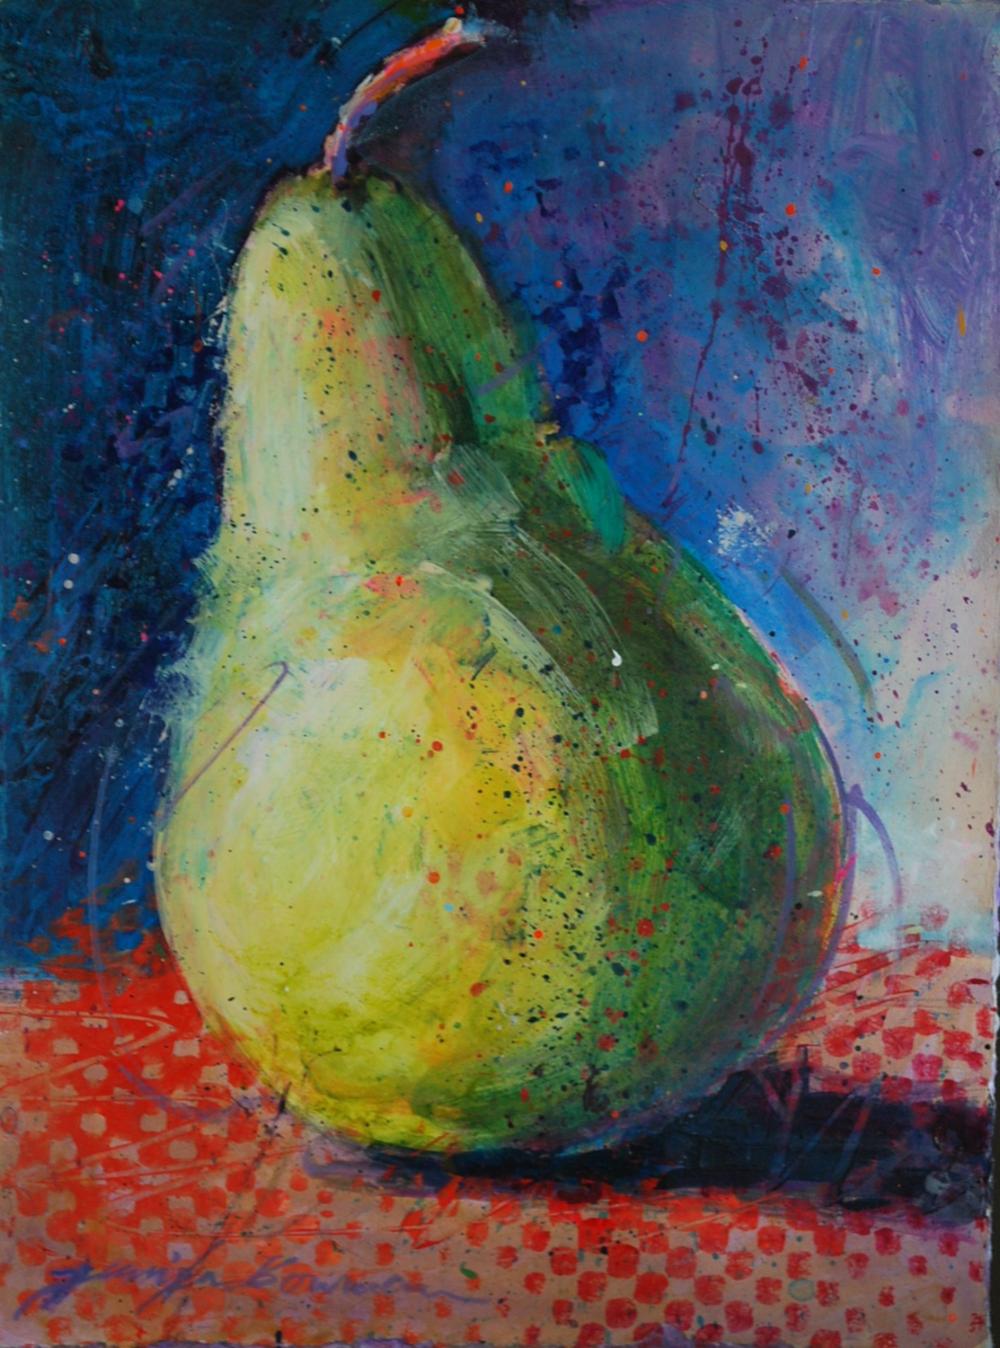 Pear_Try It Acrylics Example_Bowman.JPG